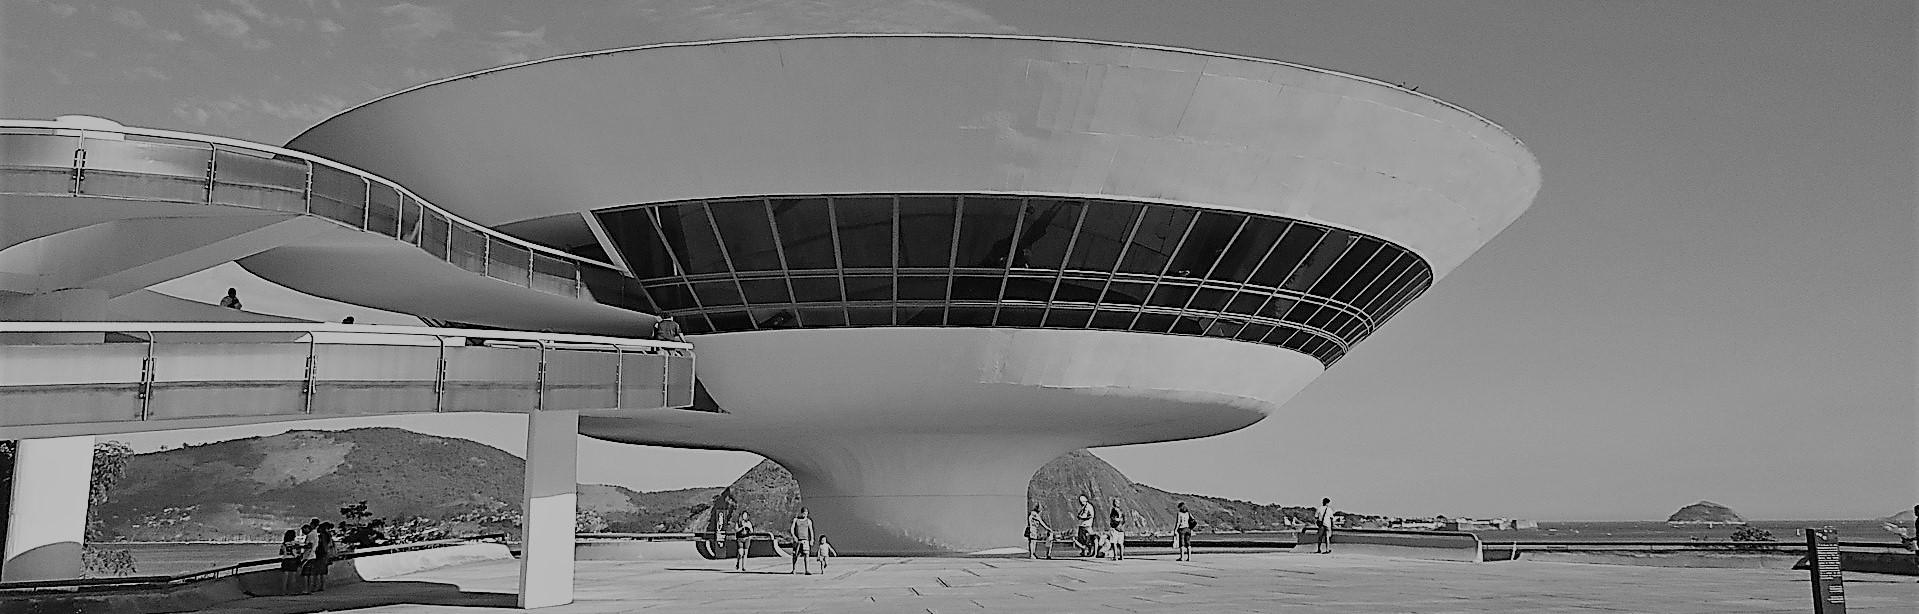 musée art contemporain de Niteroi